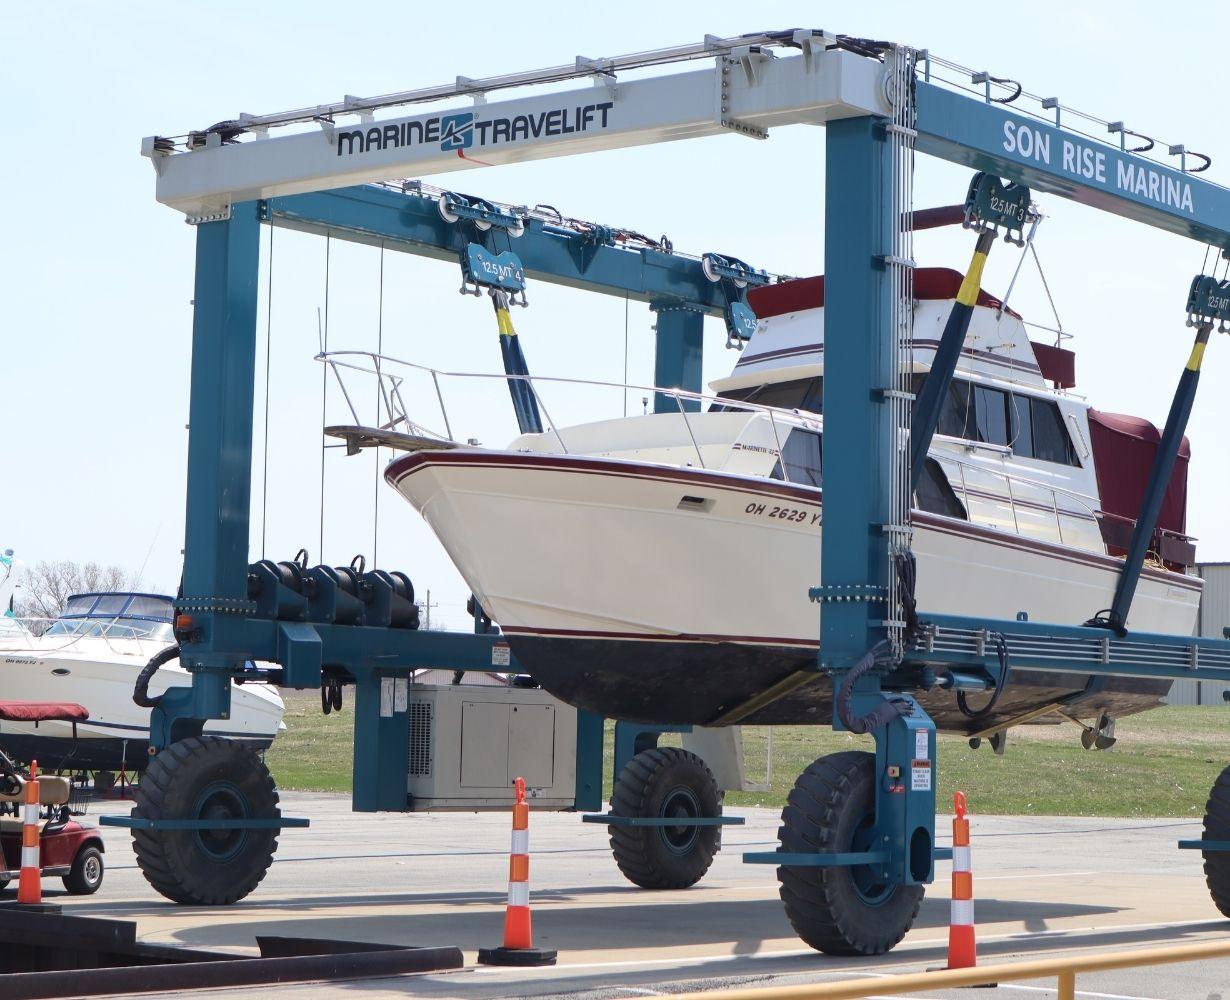 son-rise-marina-sandusky-ohio-gallery-boat